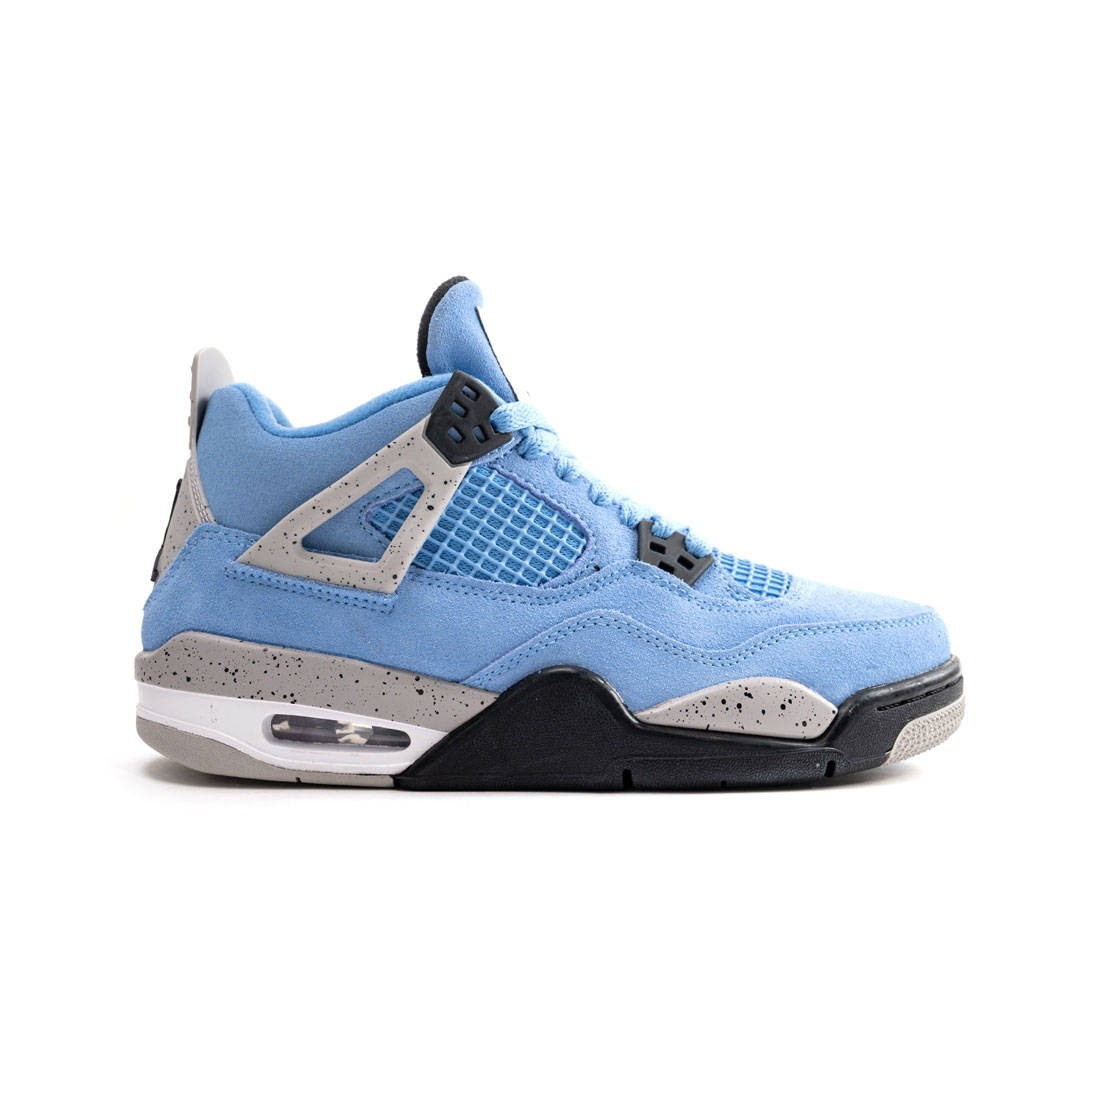 Jordan Big Kids Air Jordan 4 Retro (university blue / black-tech grey-white)